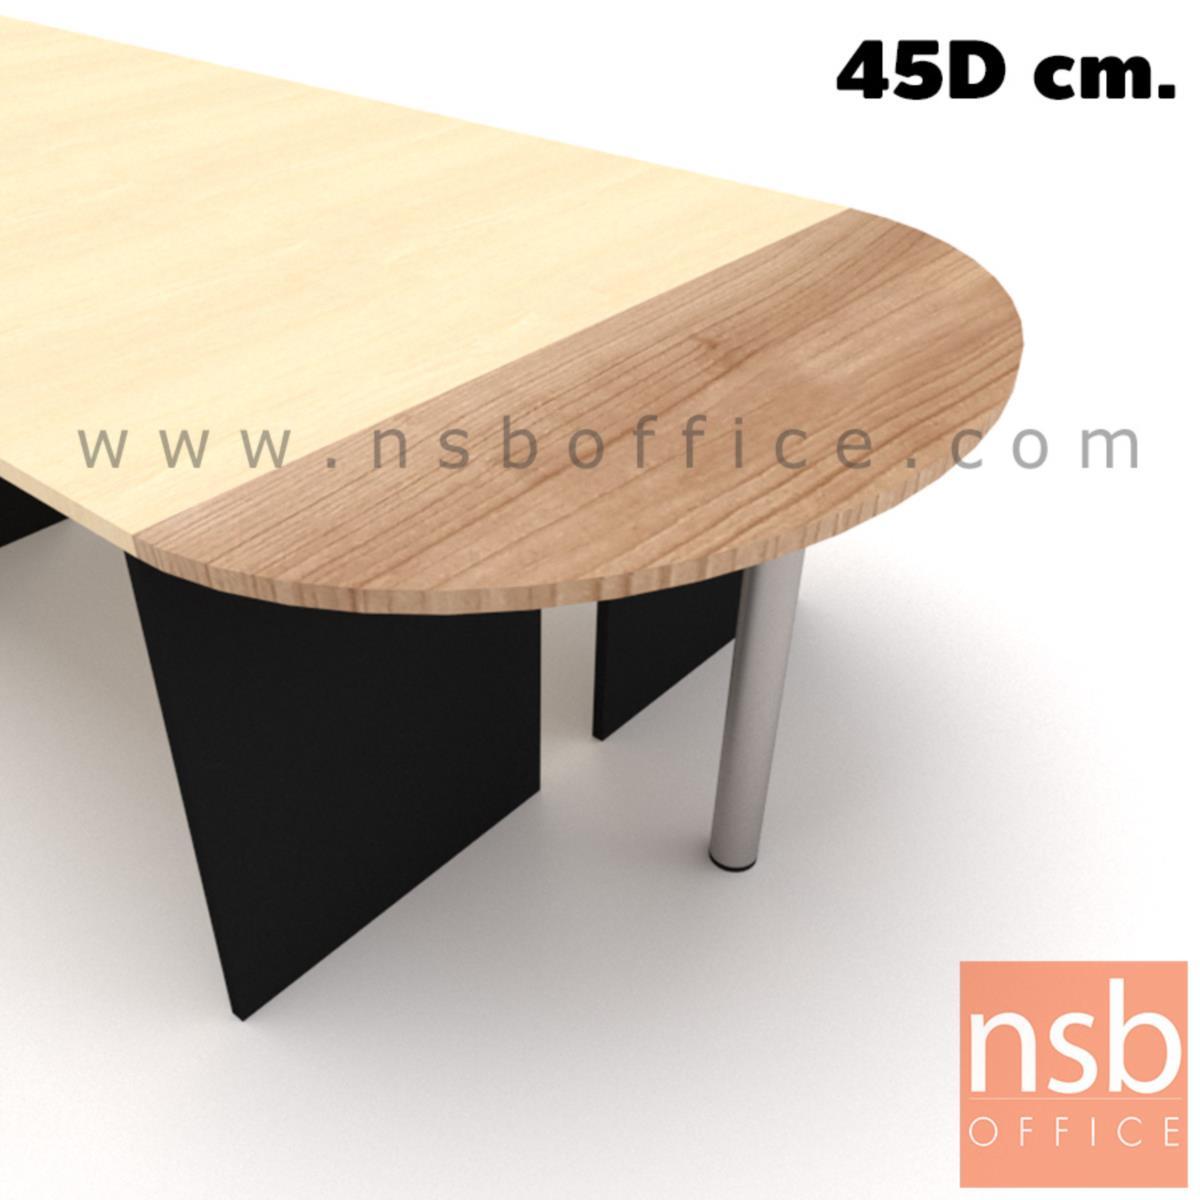 A04A060:โต๊ะเข้ามุมหัวโค้งแต่ไม่ครึ่งวงกลม รุ่น NSB-2045 ขนาด 120W ,150W ,160W*45D cm.  ขากลมโครเมี่ยม